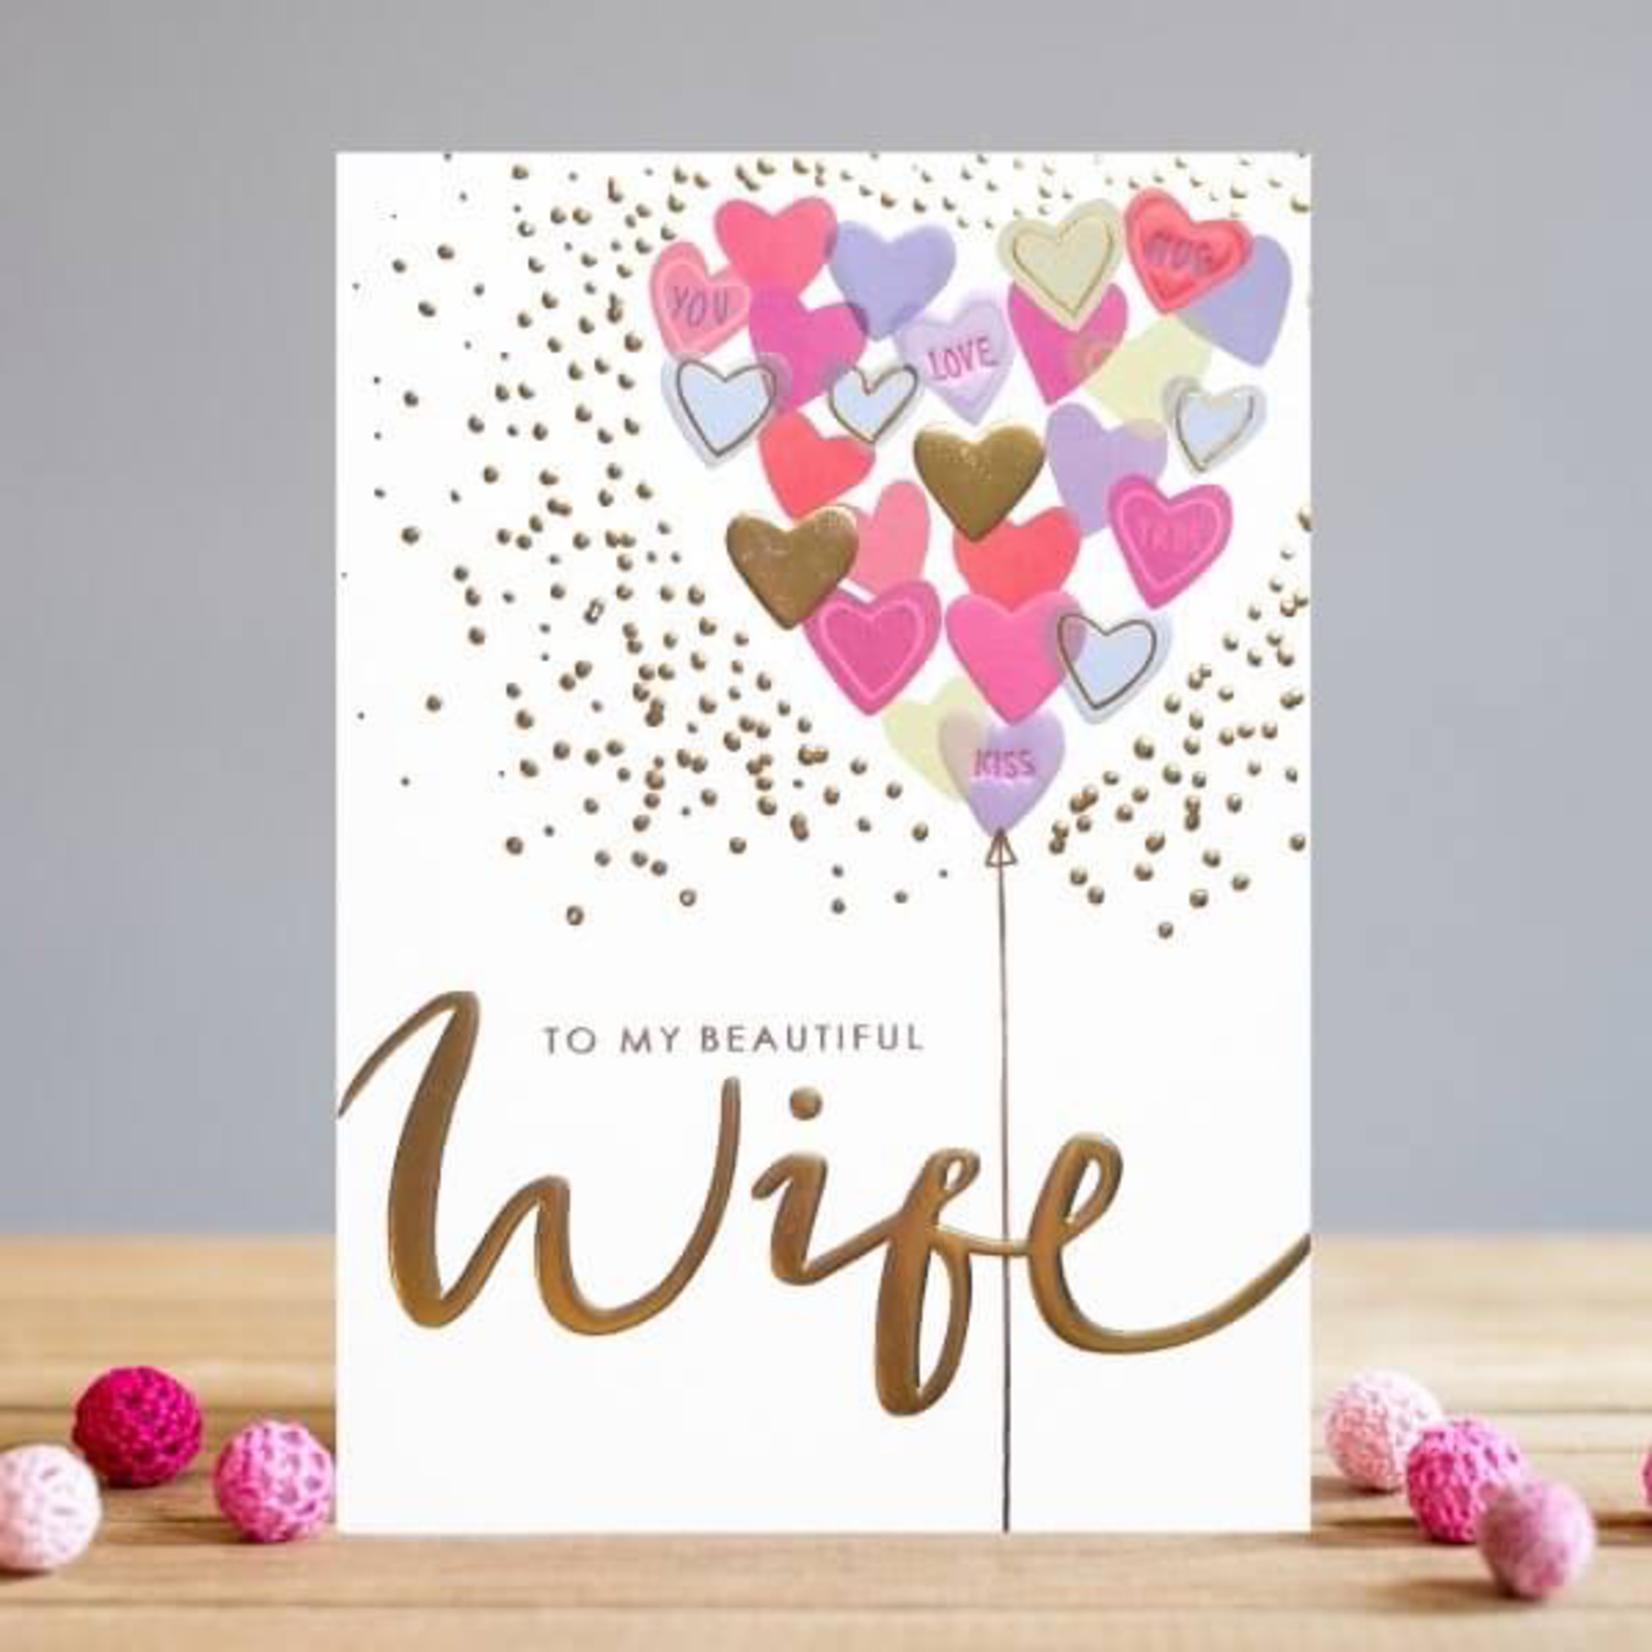 Louise Tiler BEAUTIFUL WIFE CARD